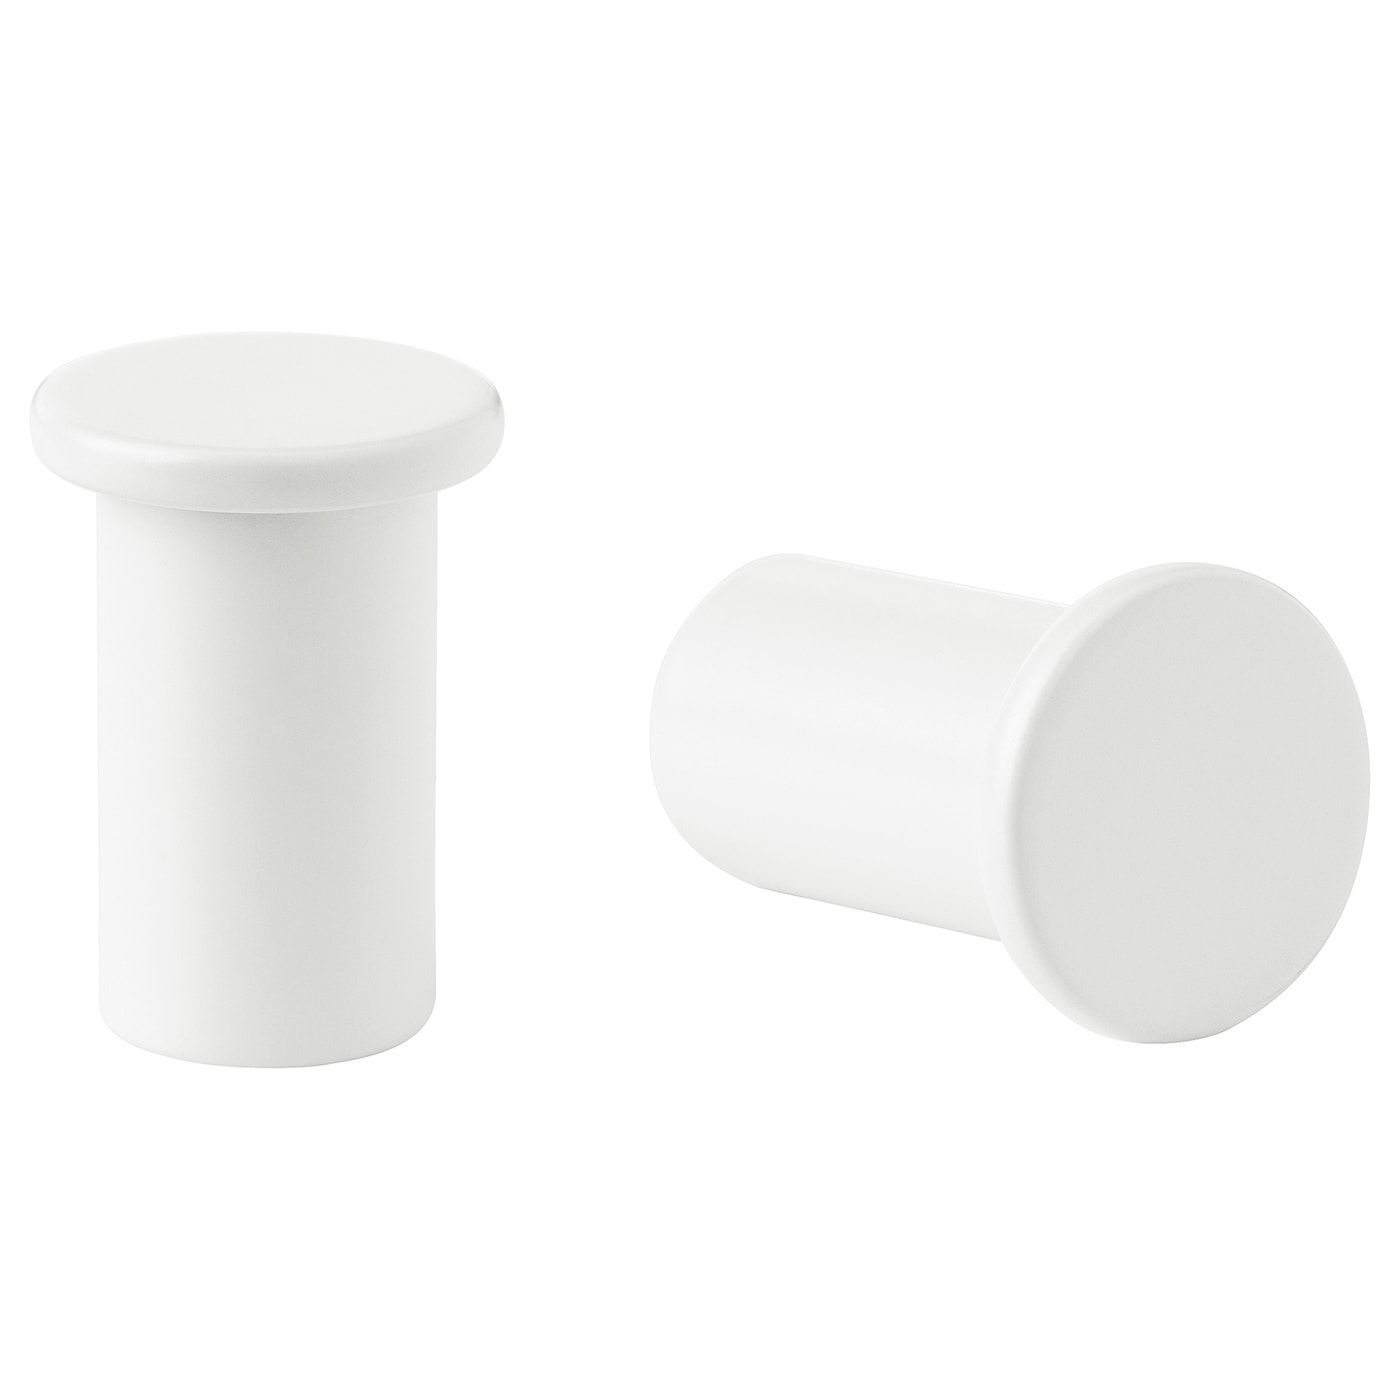 Ikea - Bängbula Crochet Blanc   Ikea, Blanc Et Revetement concernant Rideau Fil Ikea